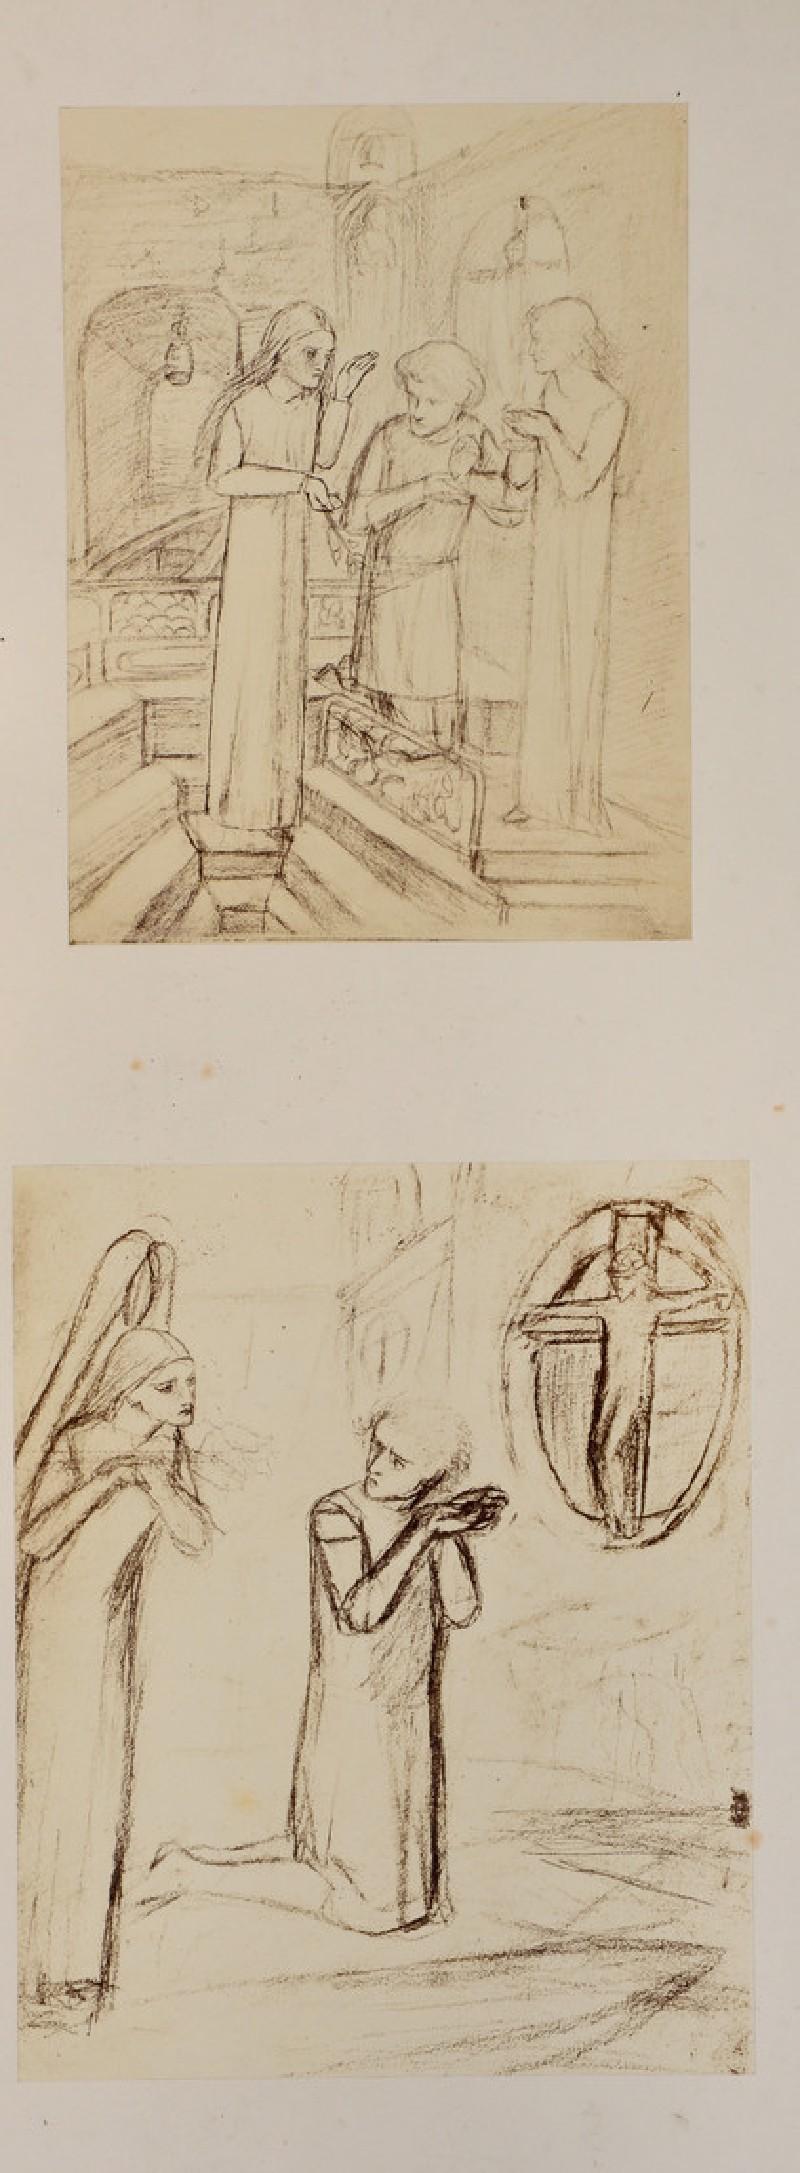 Two studies for 'Sir Galahad'